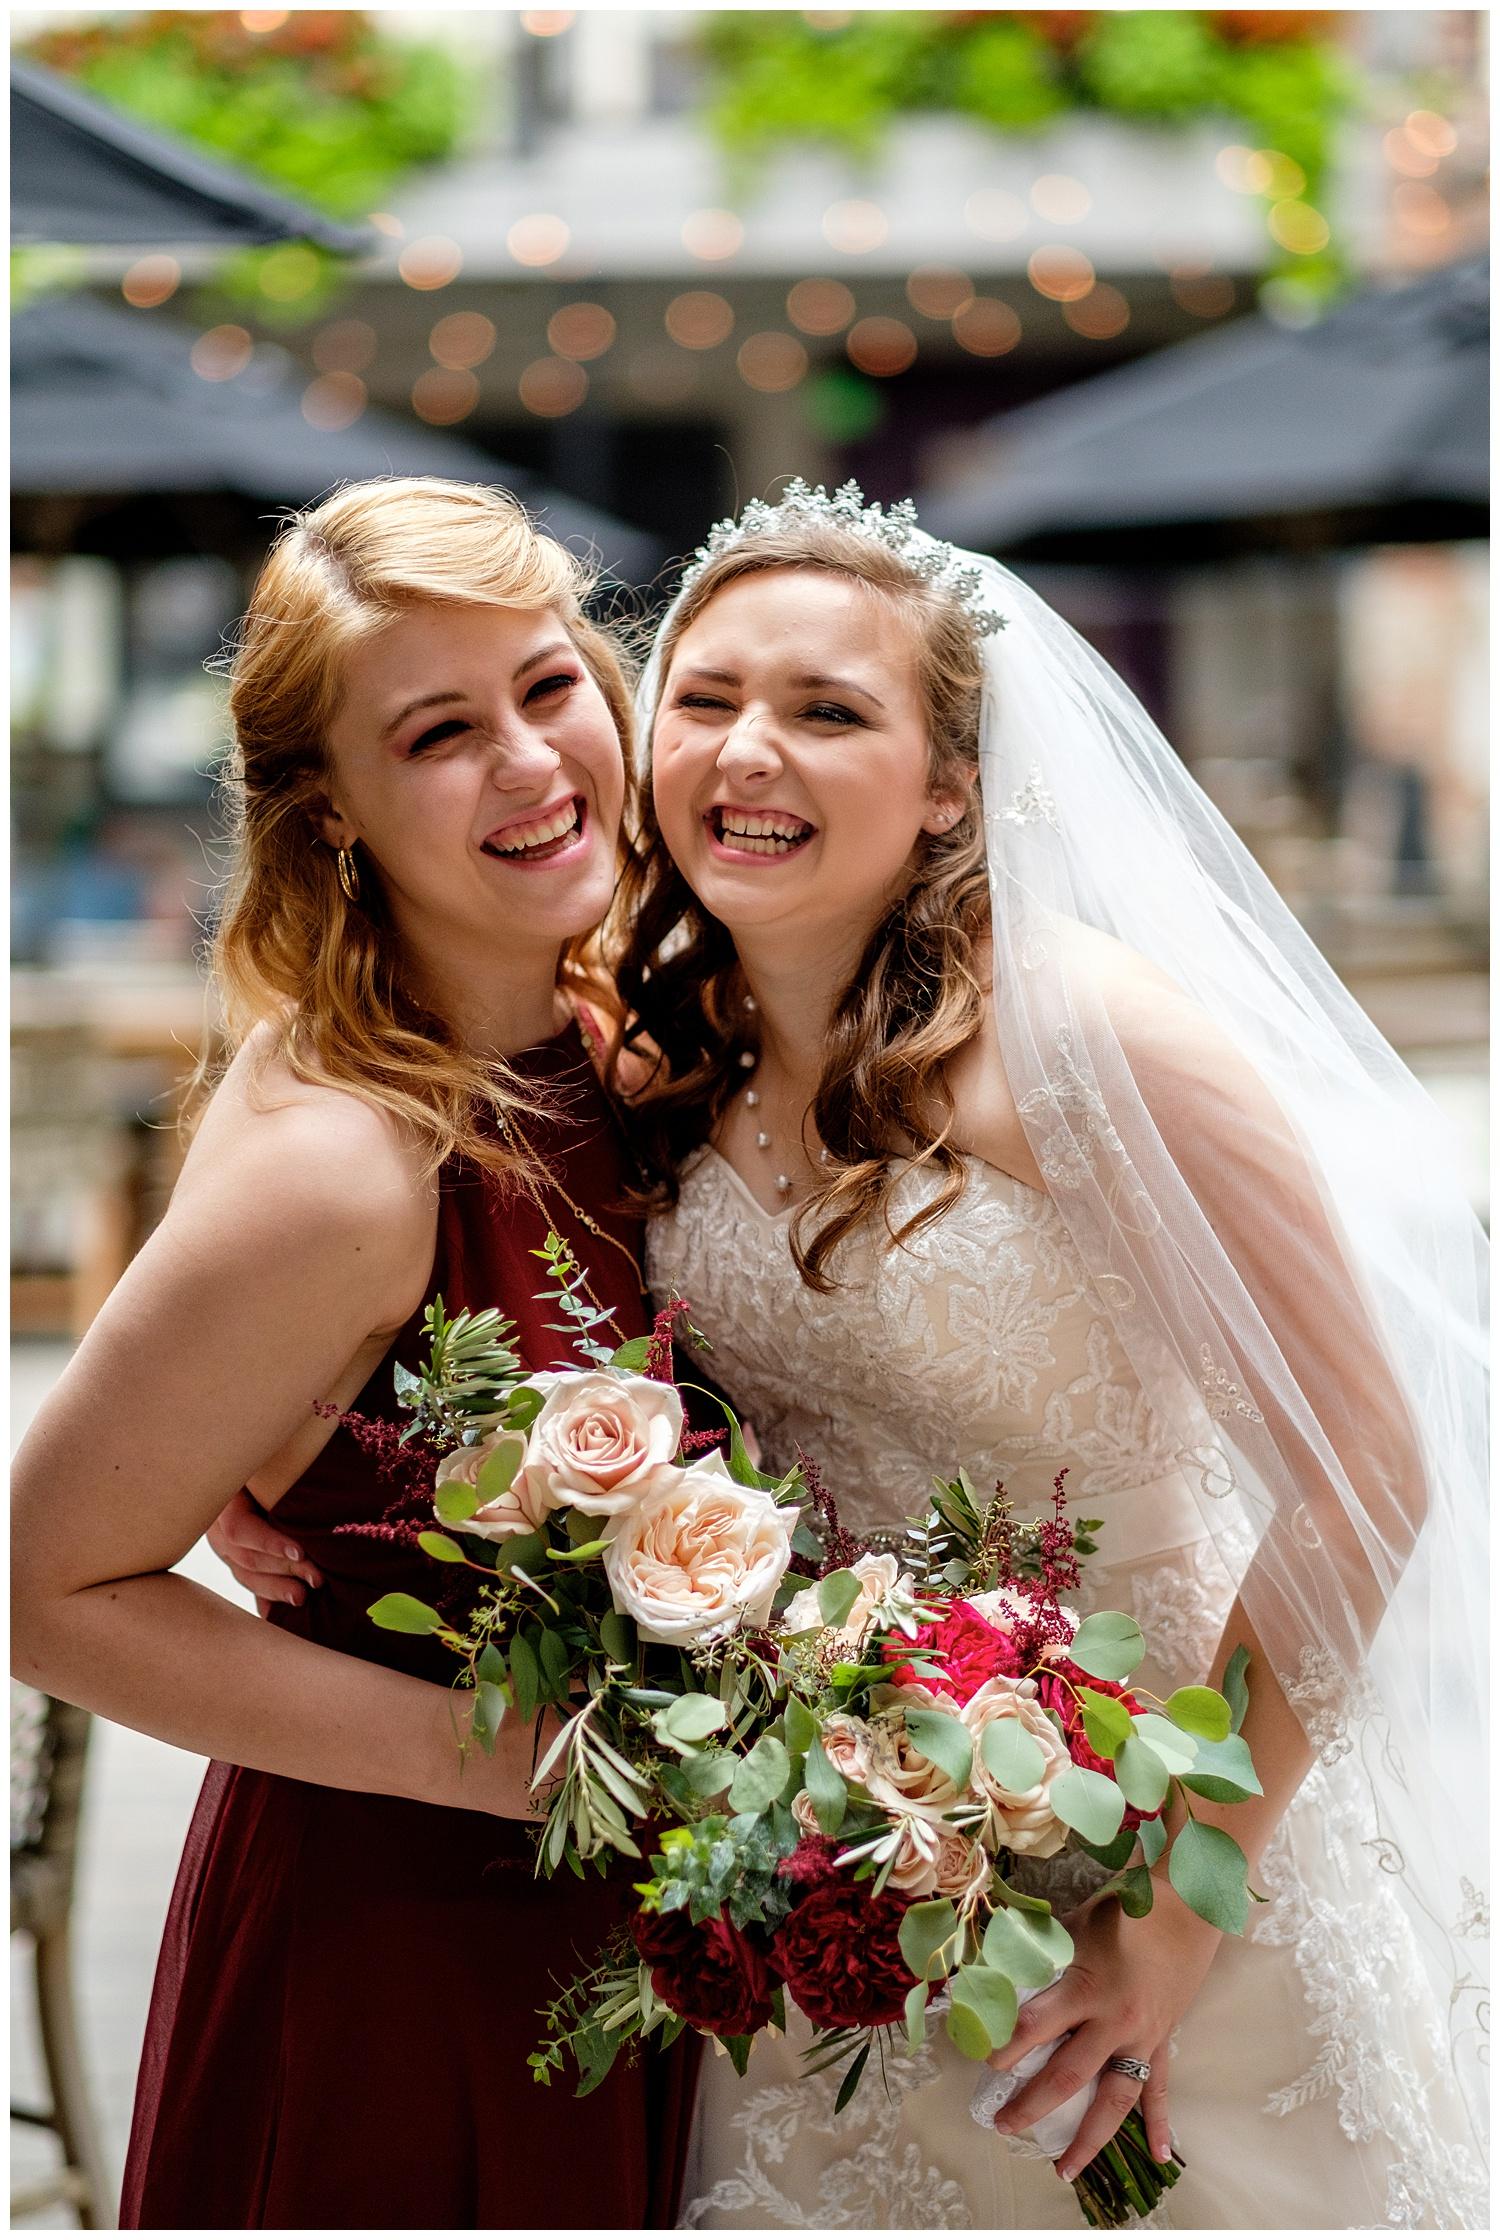 TheSmythCollective-Best-Cincinnati-Wedding-Photographer-Urban-Downtown-Covington-Wedding-16.jpg